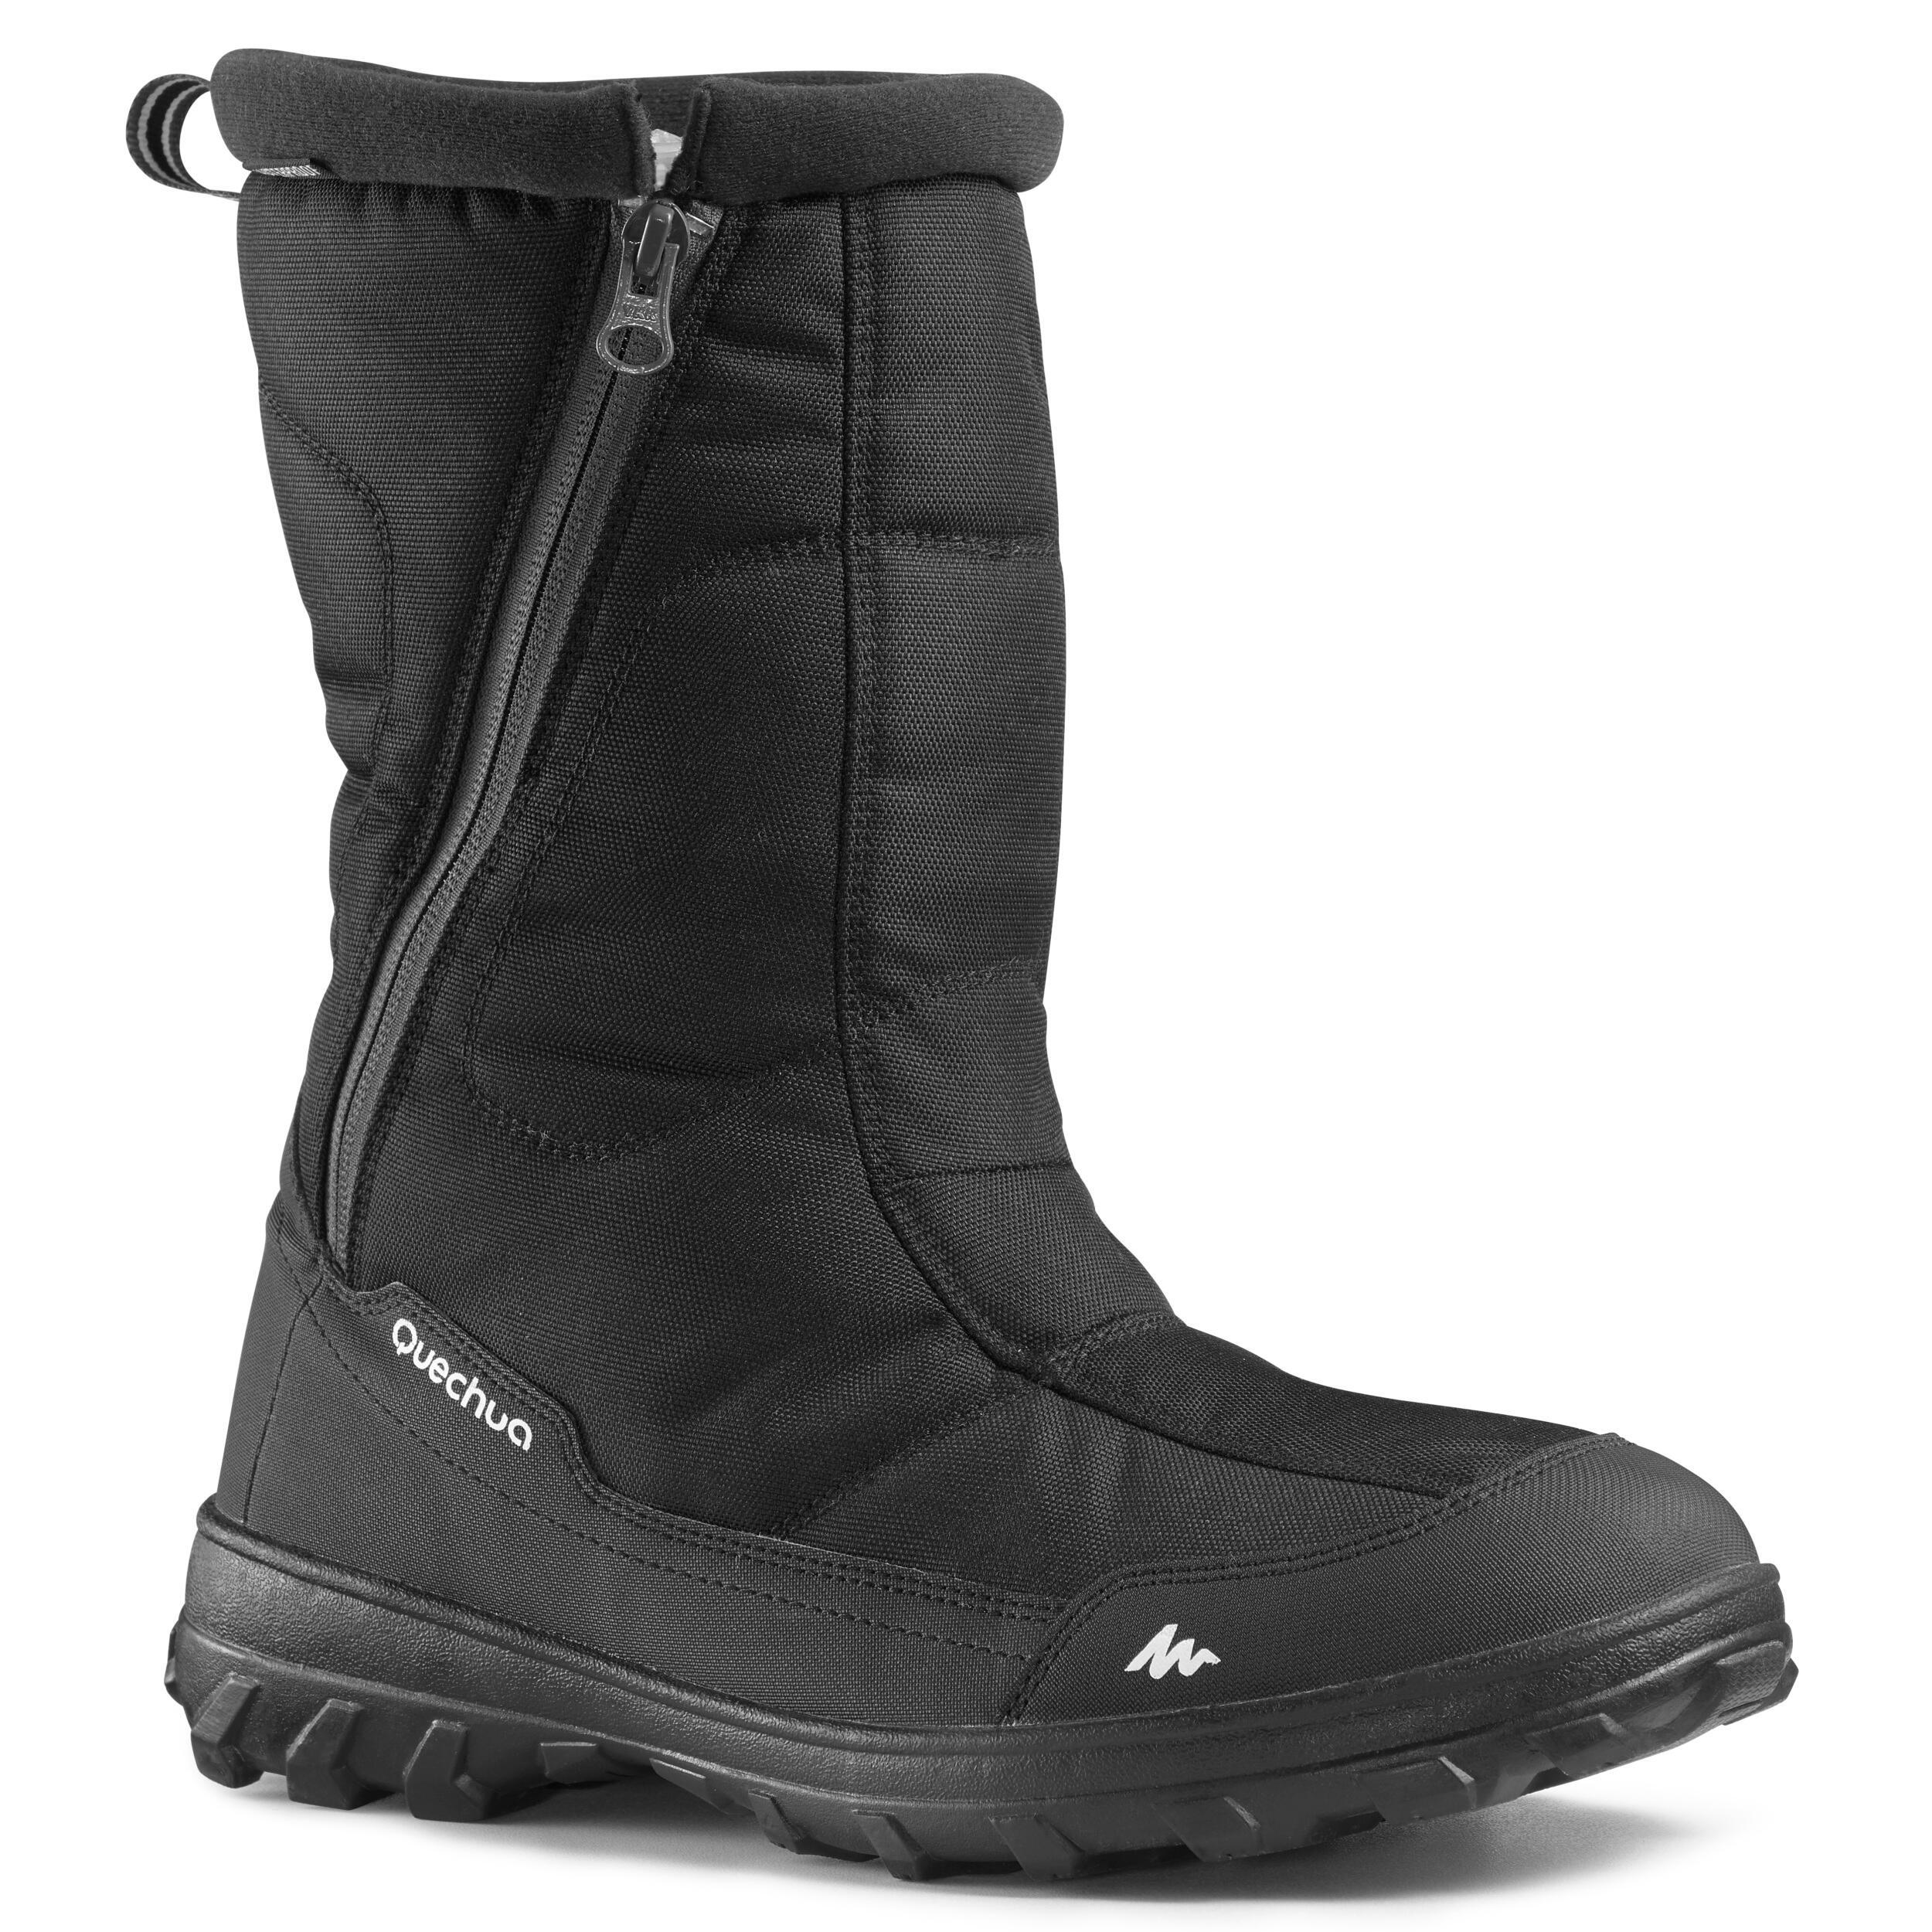 Winterstiefel Winterwandern SH100 Extra-Warm Herren schwarz | Schuhe > Boots > Winterstiefel | Quechua